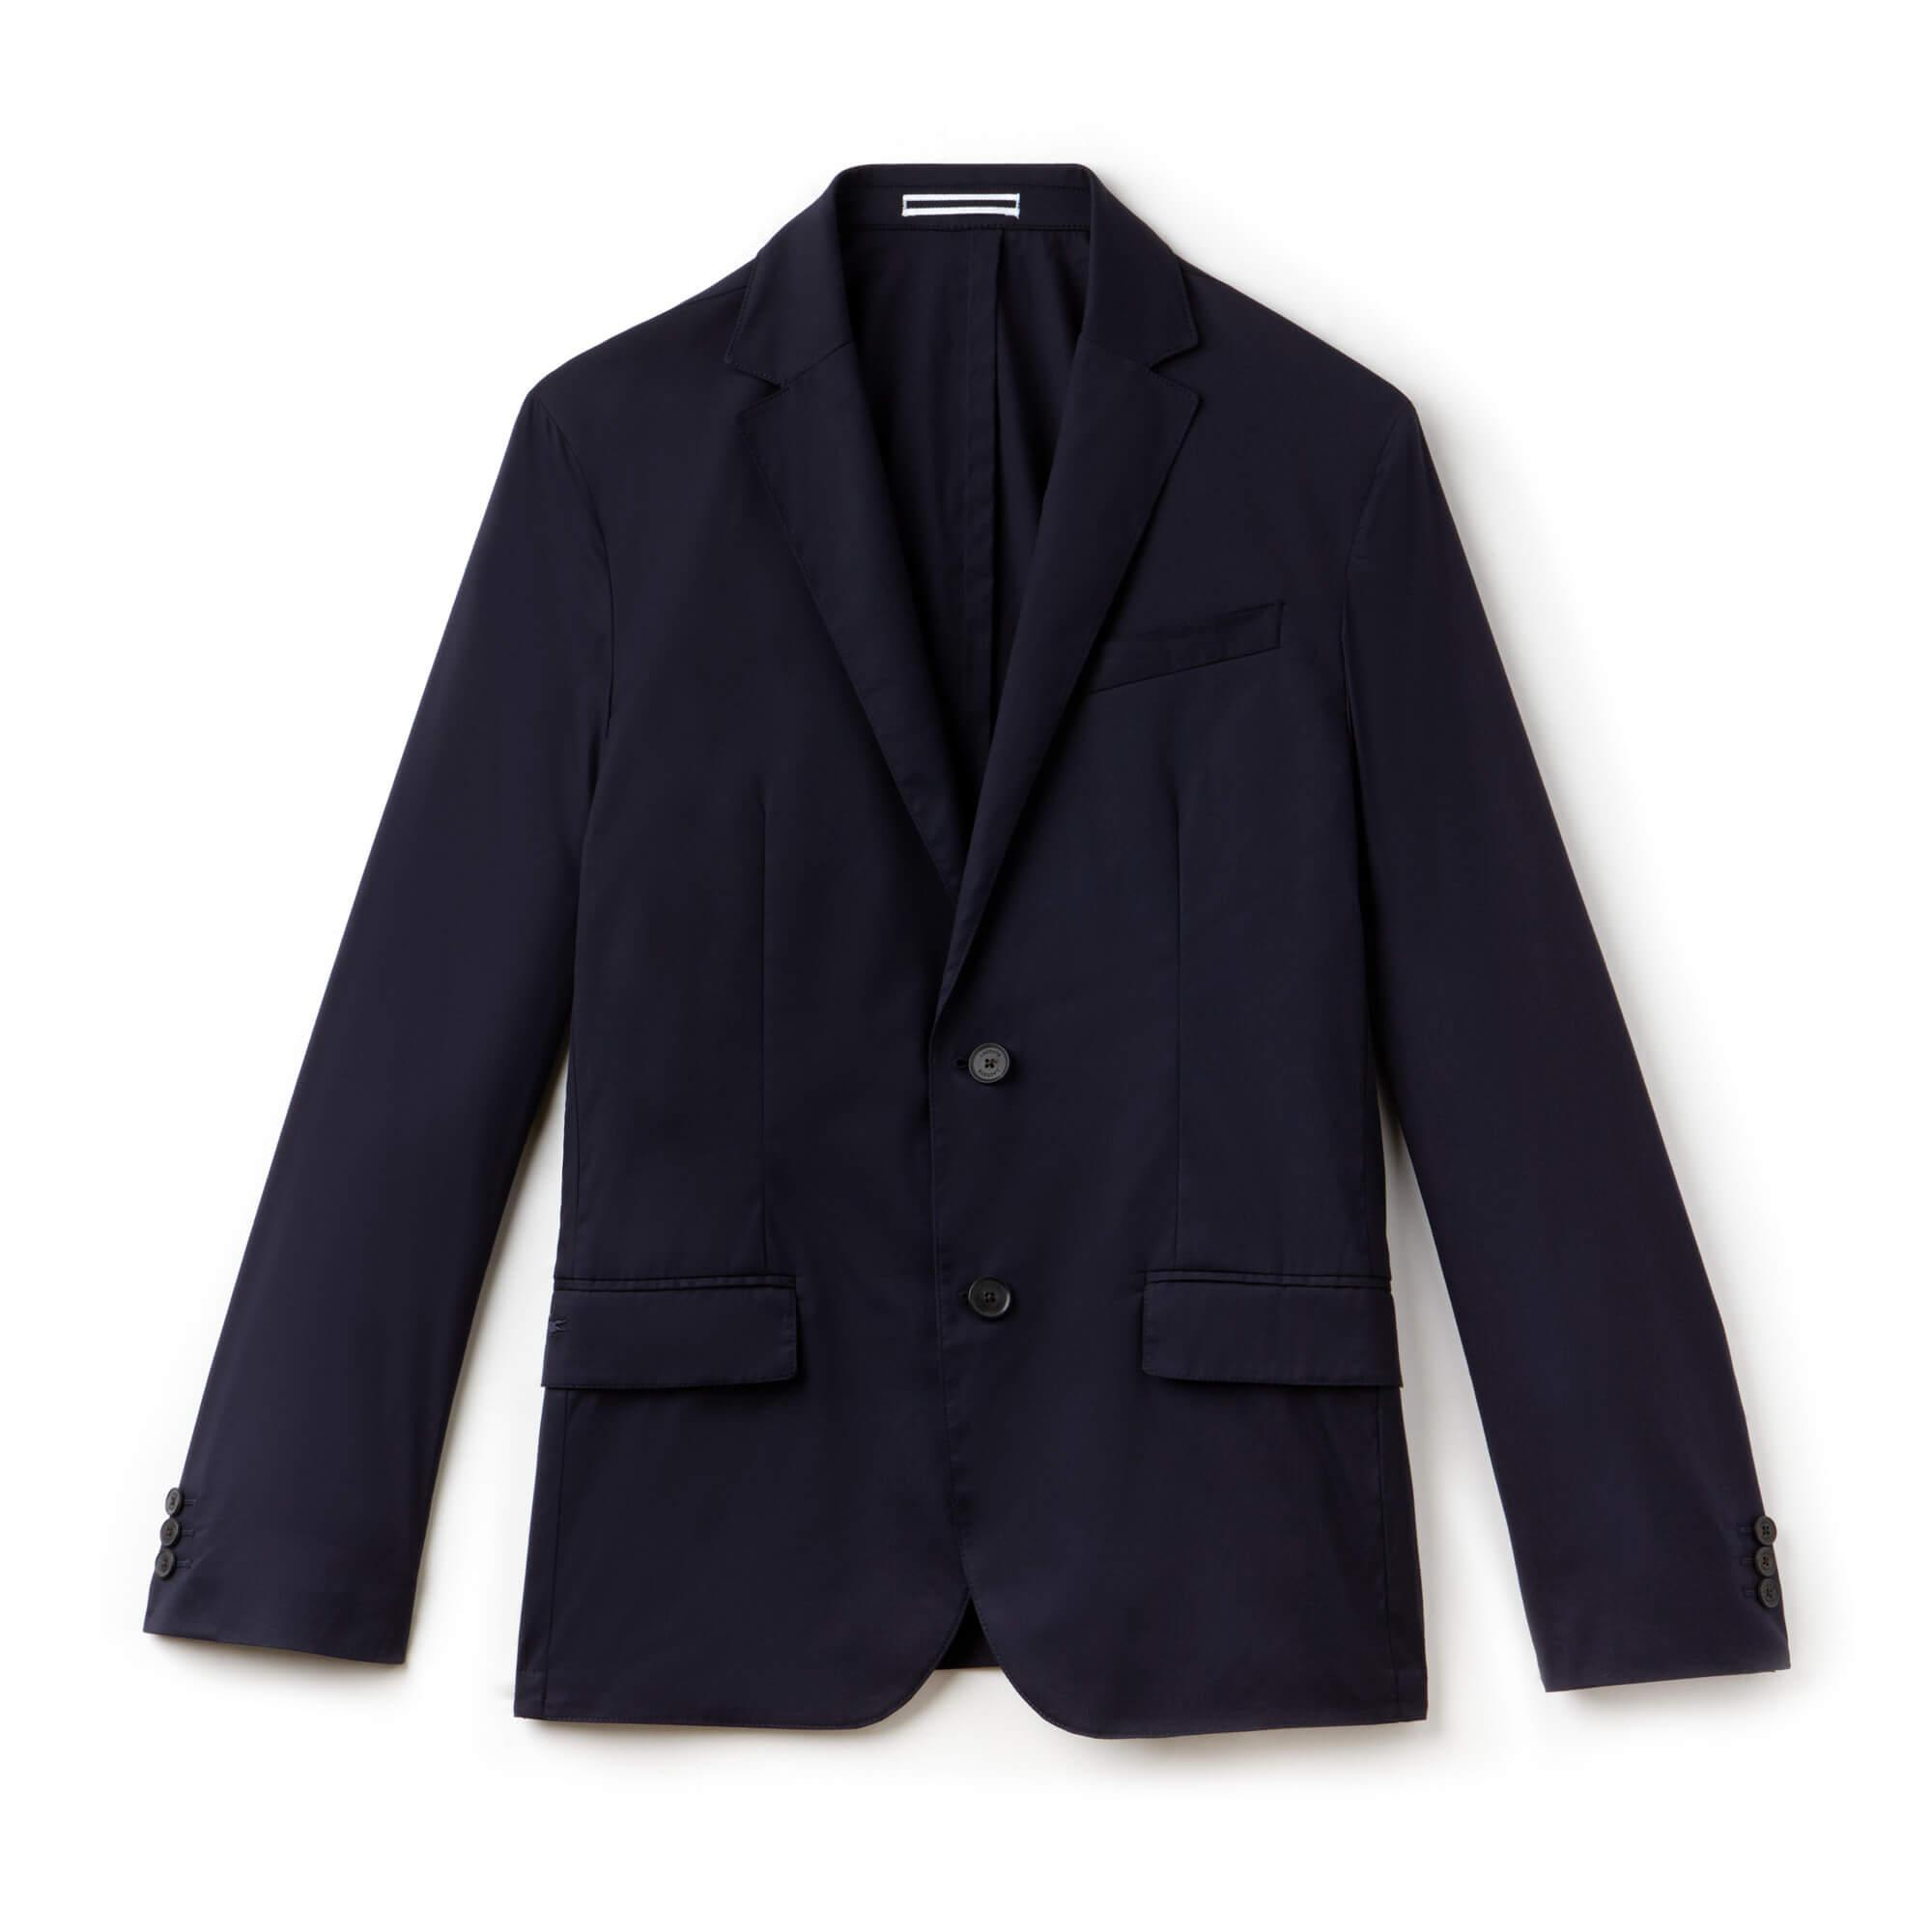 Lacoste Men's Blazer